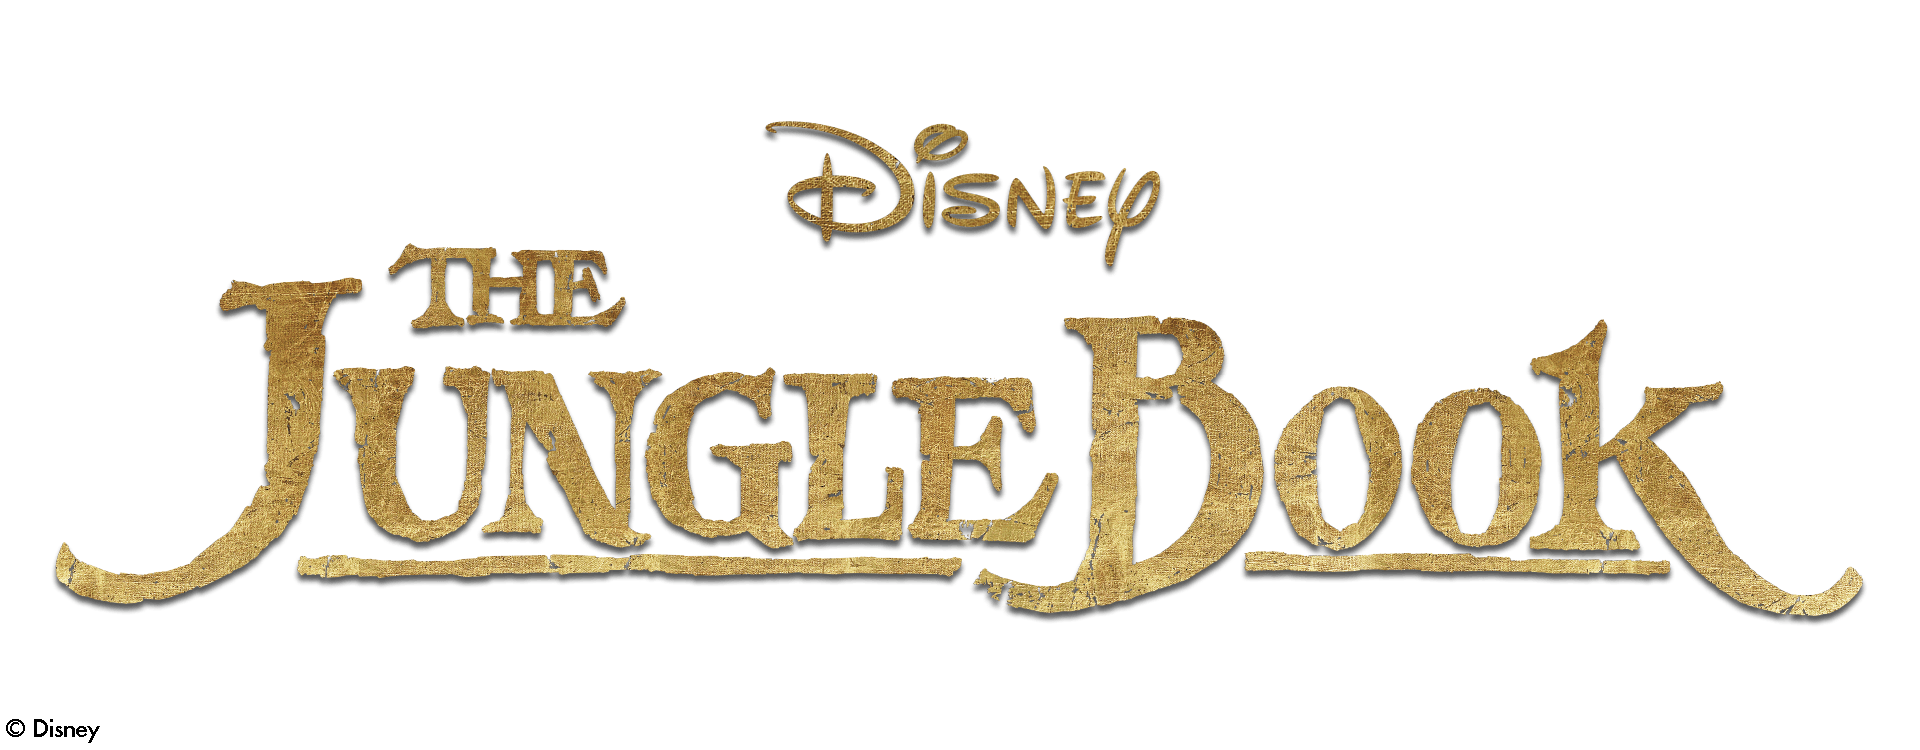 The Jungle Book Logo.